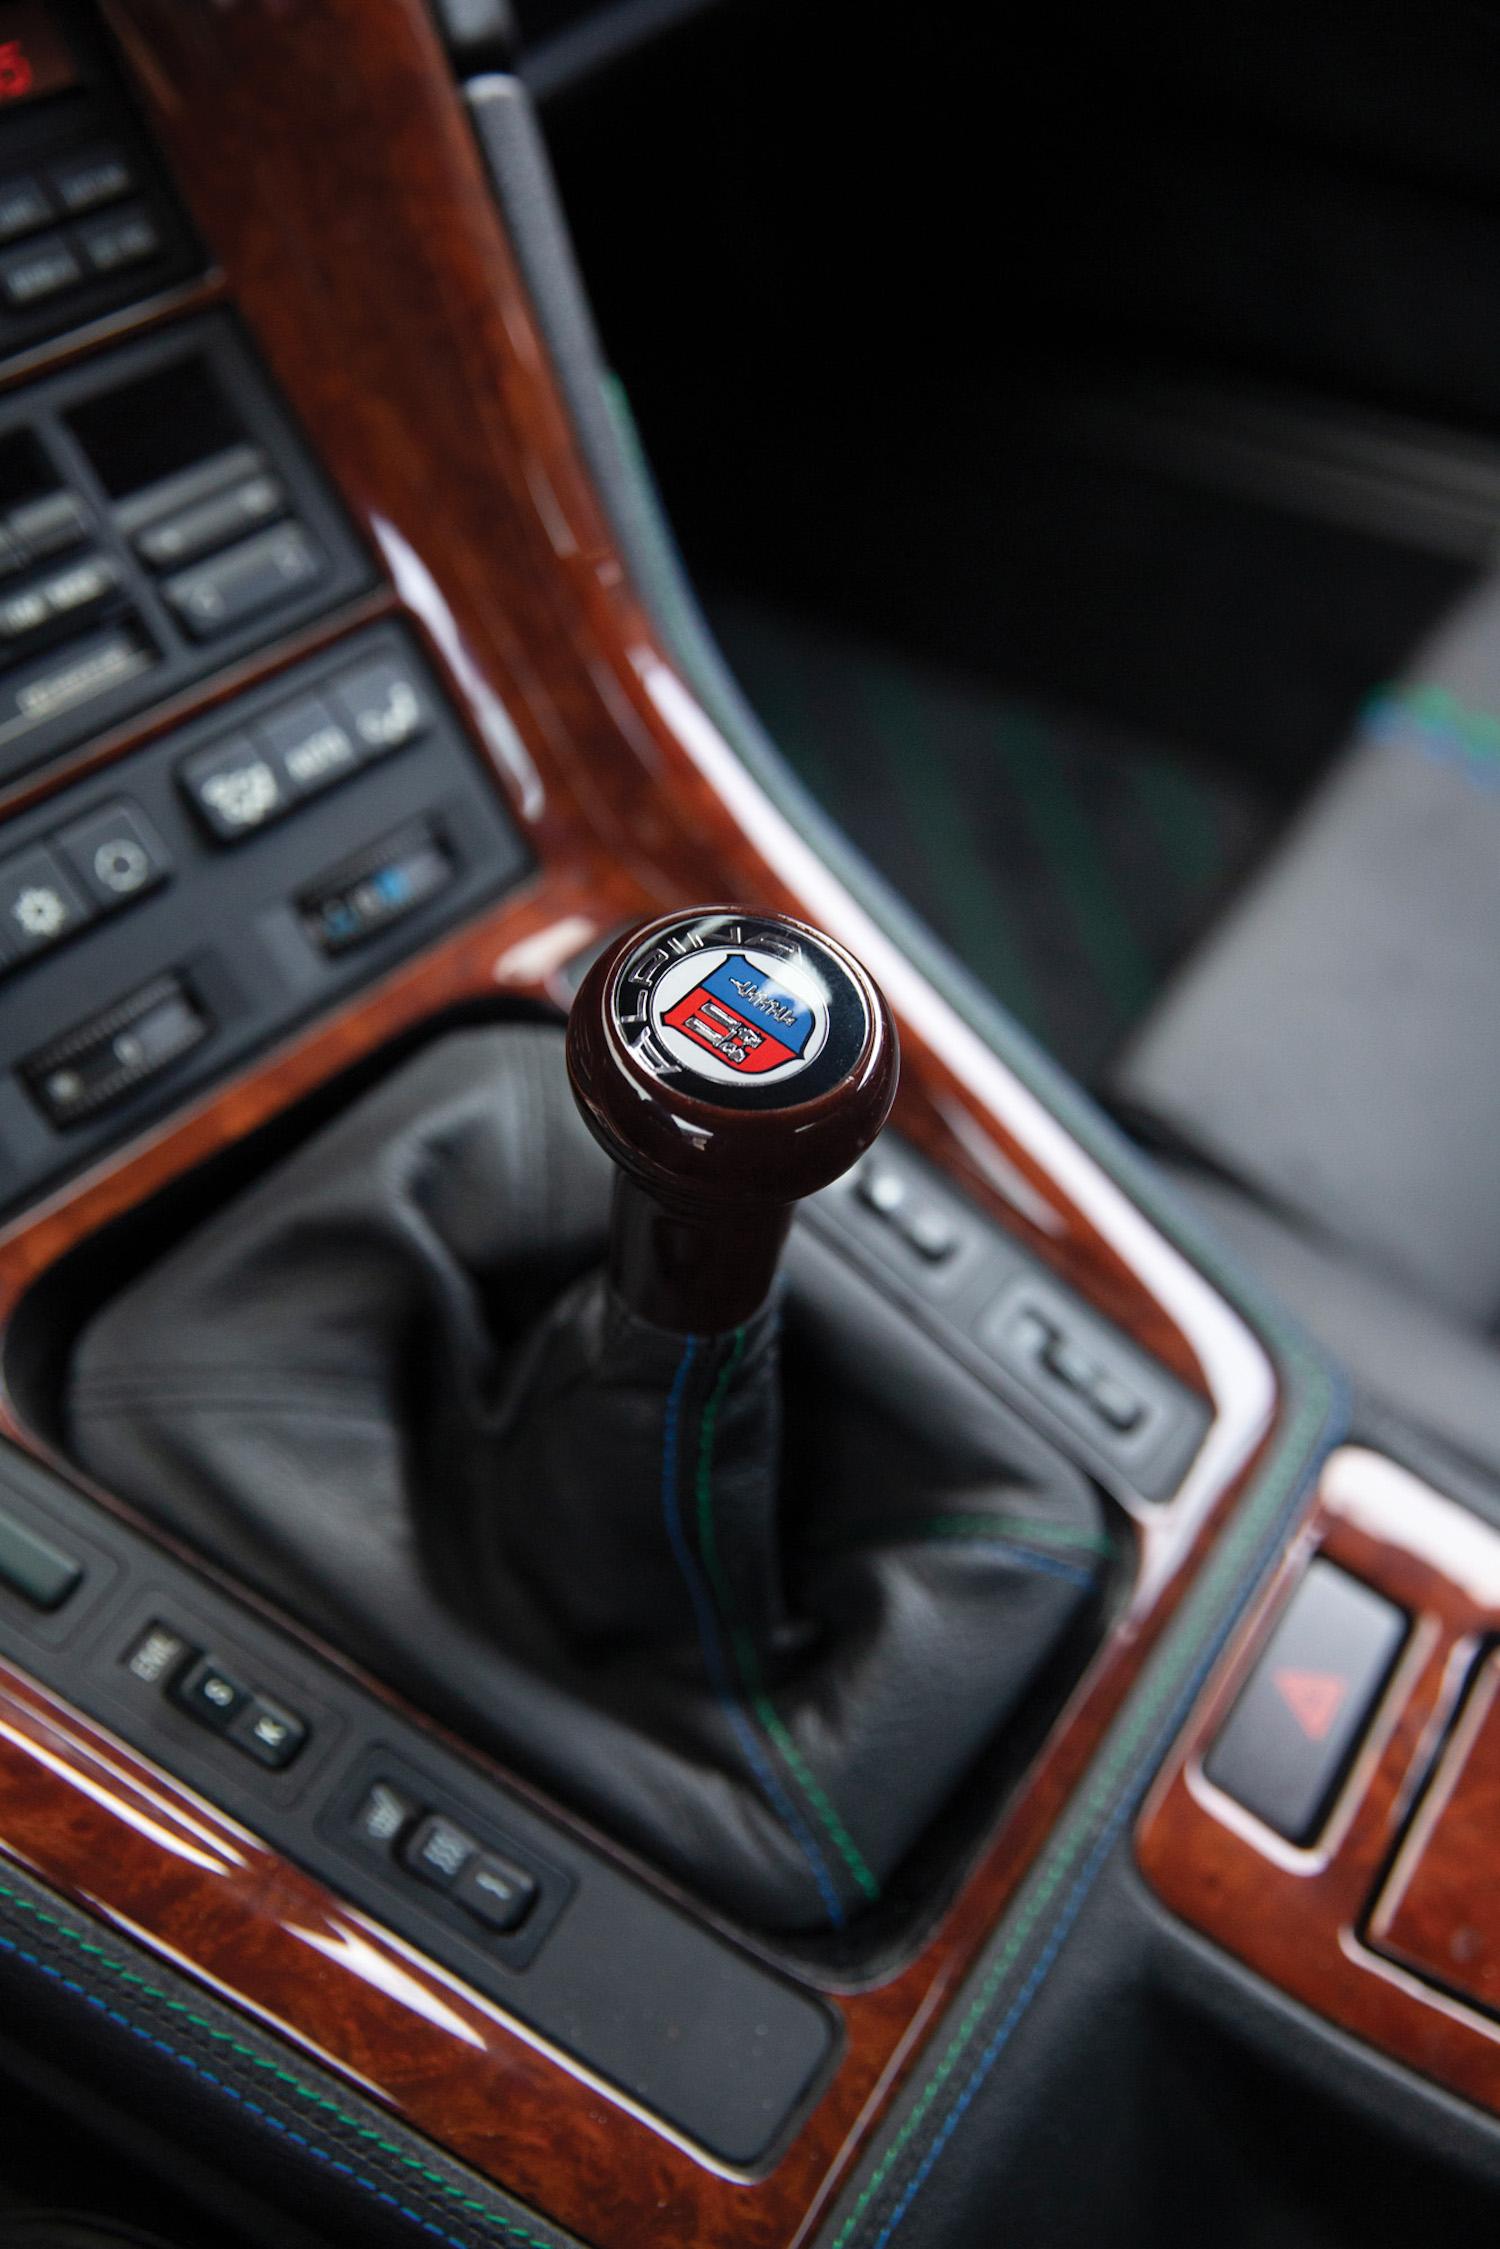 1993 BMW Alpina B12 5.7 Coupe manual shifter